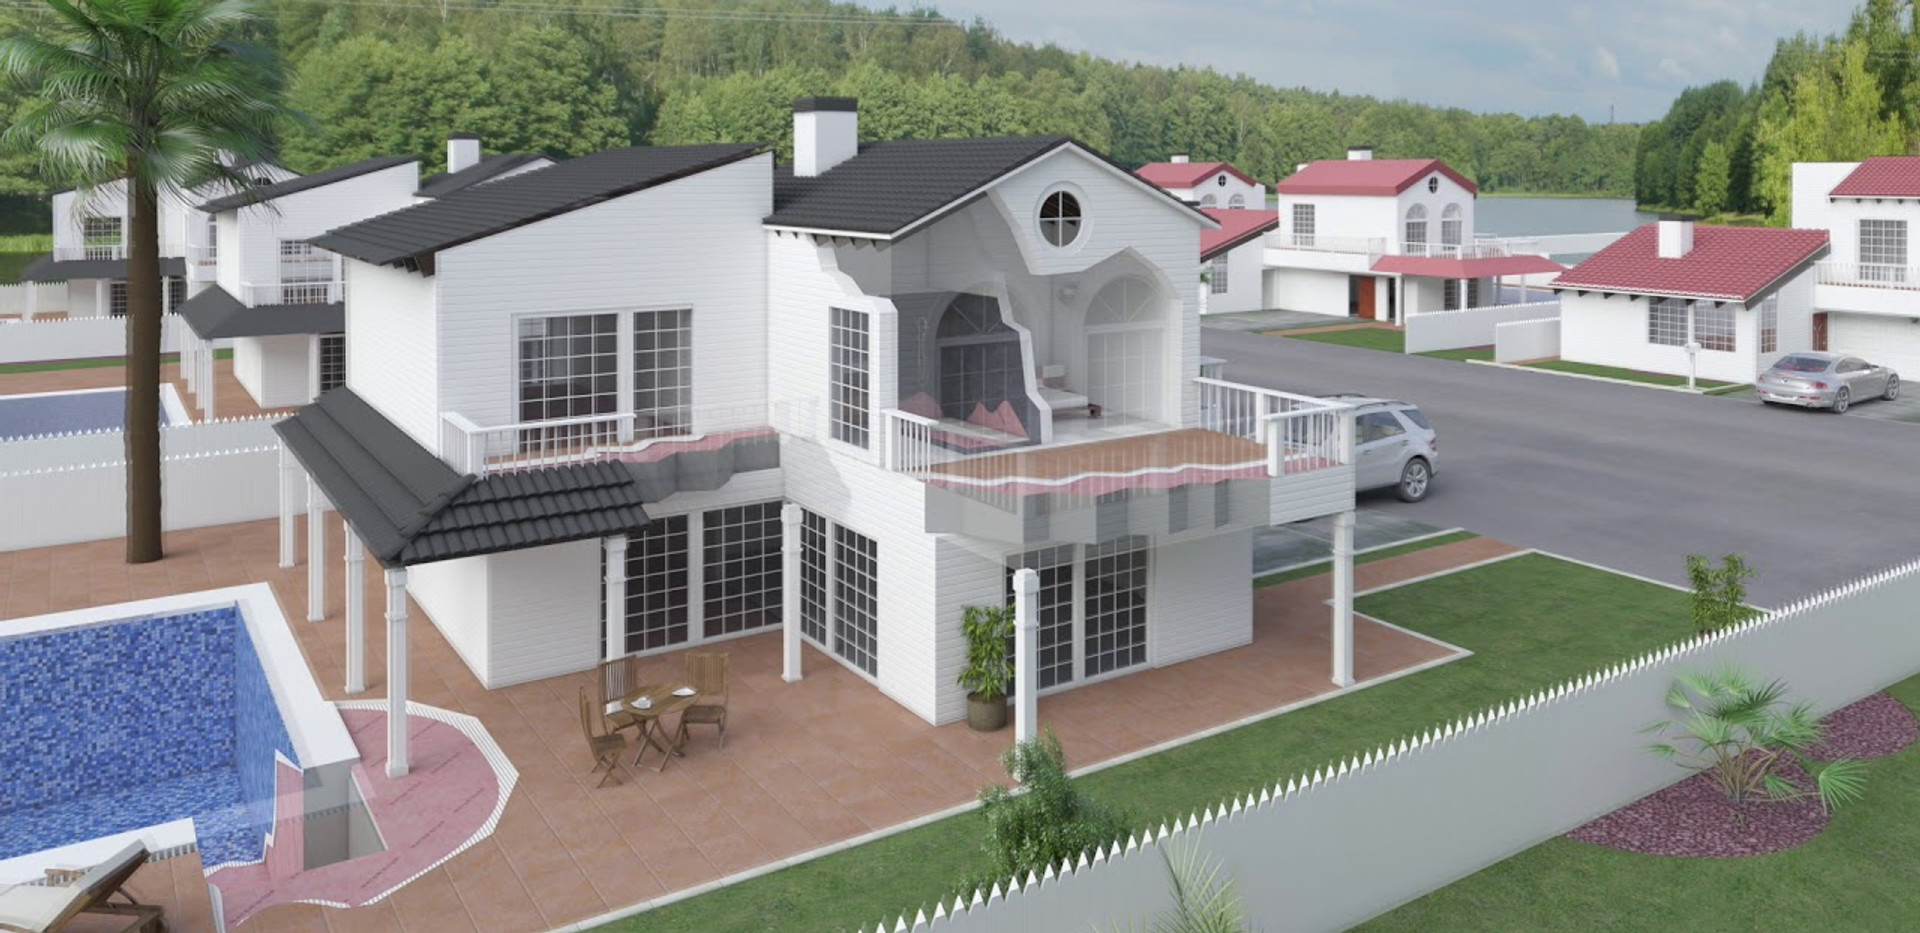 General view of the waterproofing membrane WATER-STOP n a house